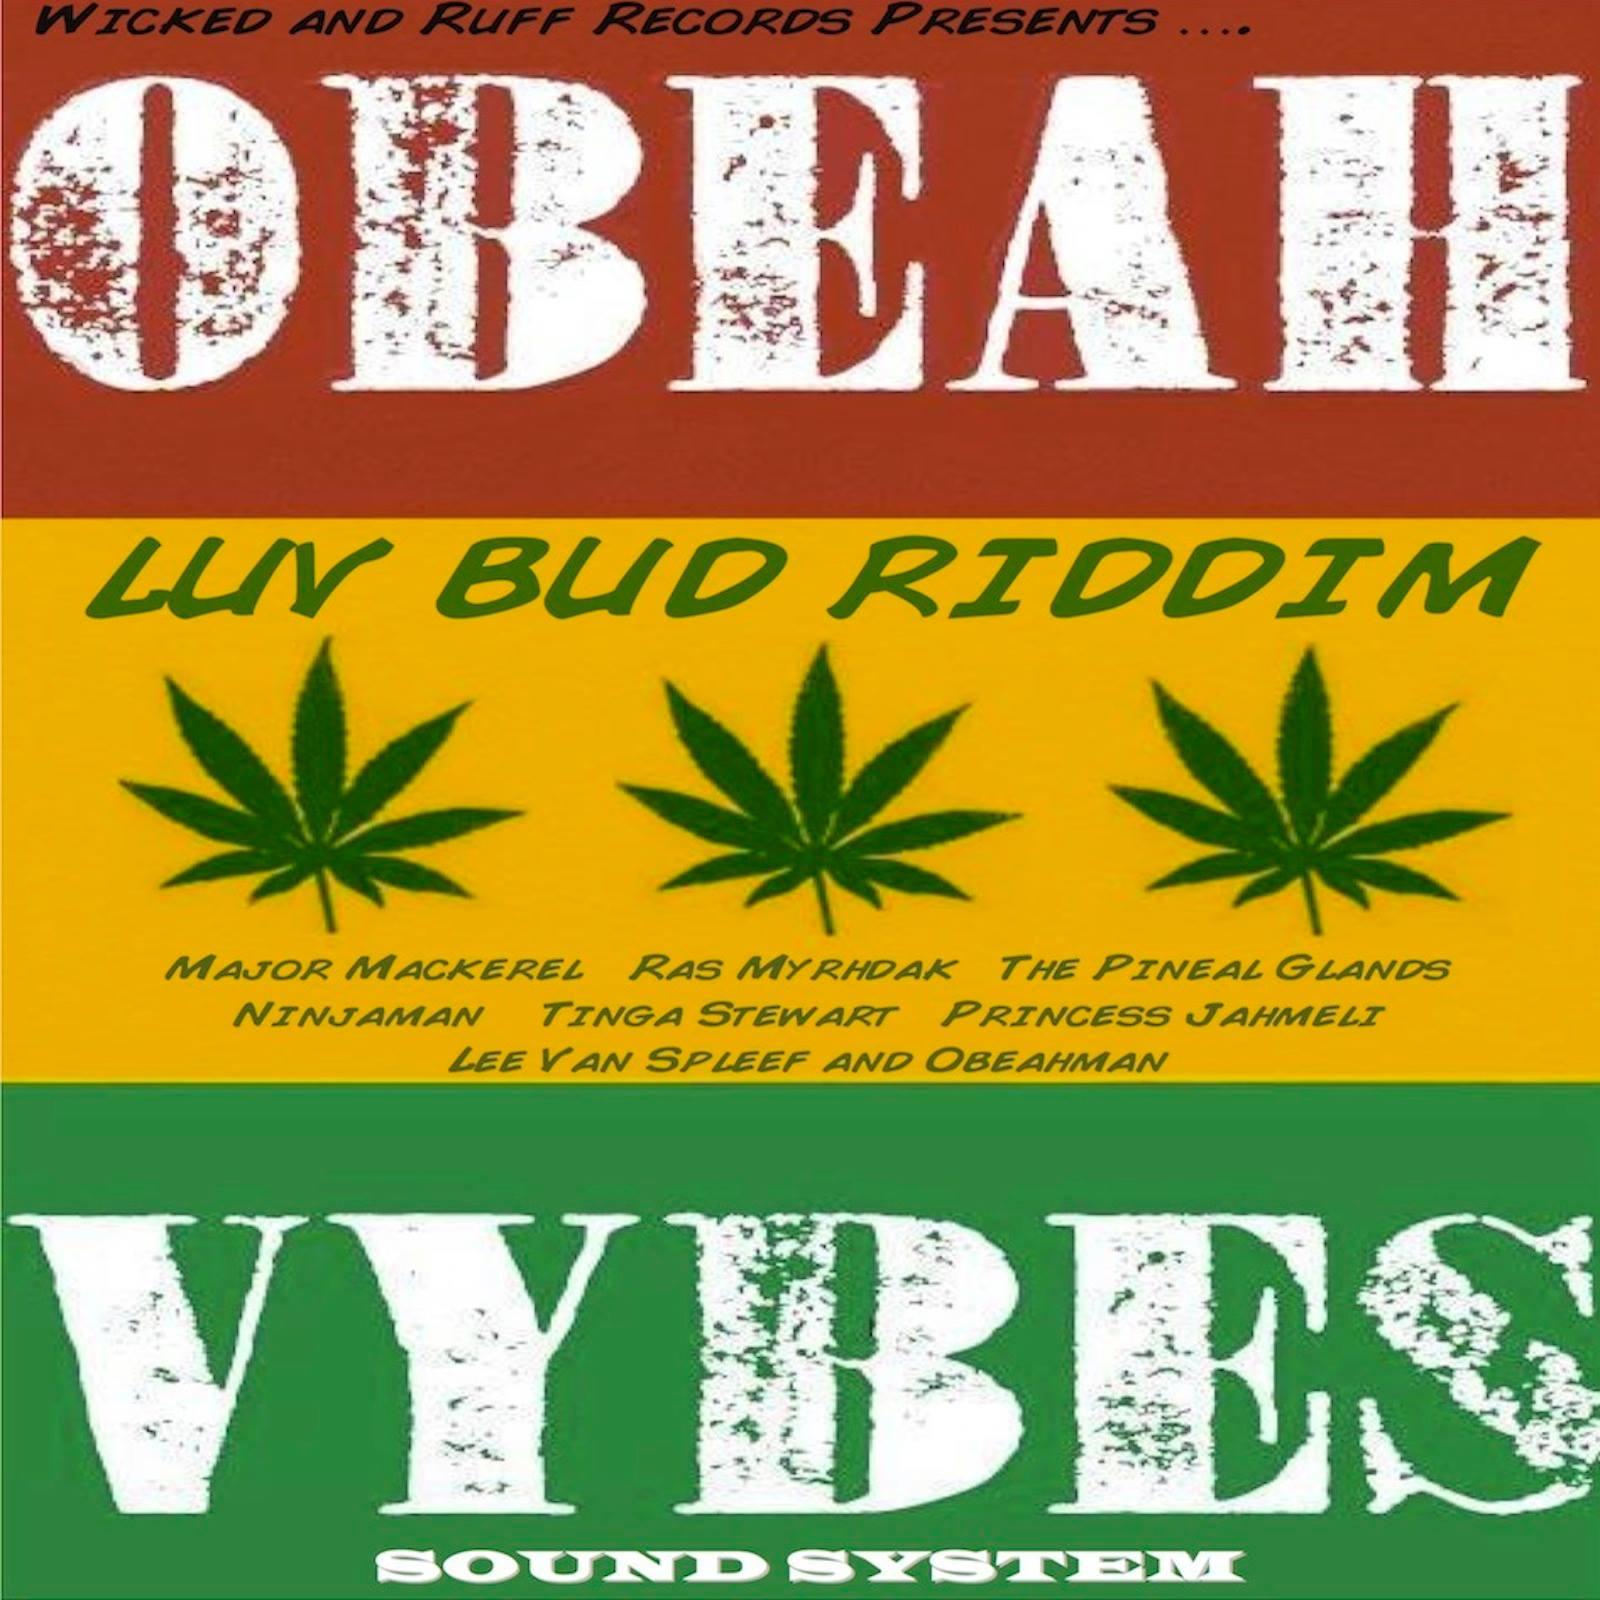 Luv-Bud-Riddim-Wicked-Ruff-Records-Cover